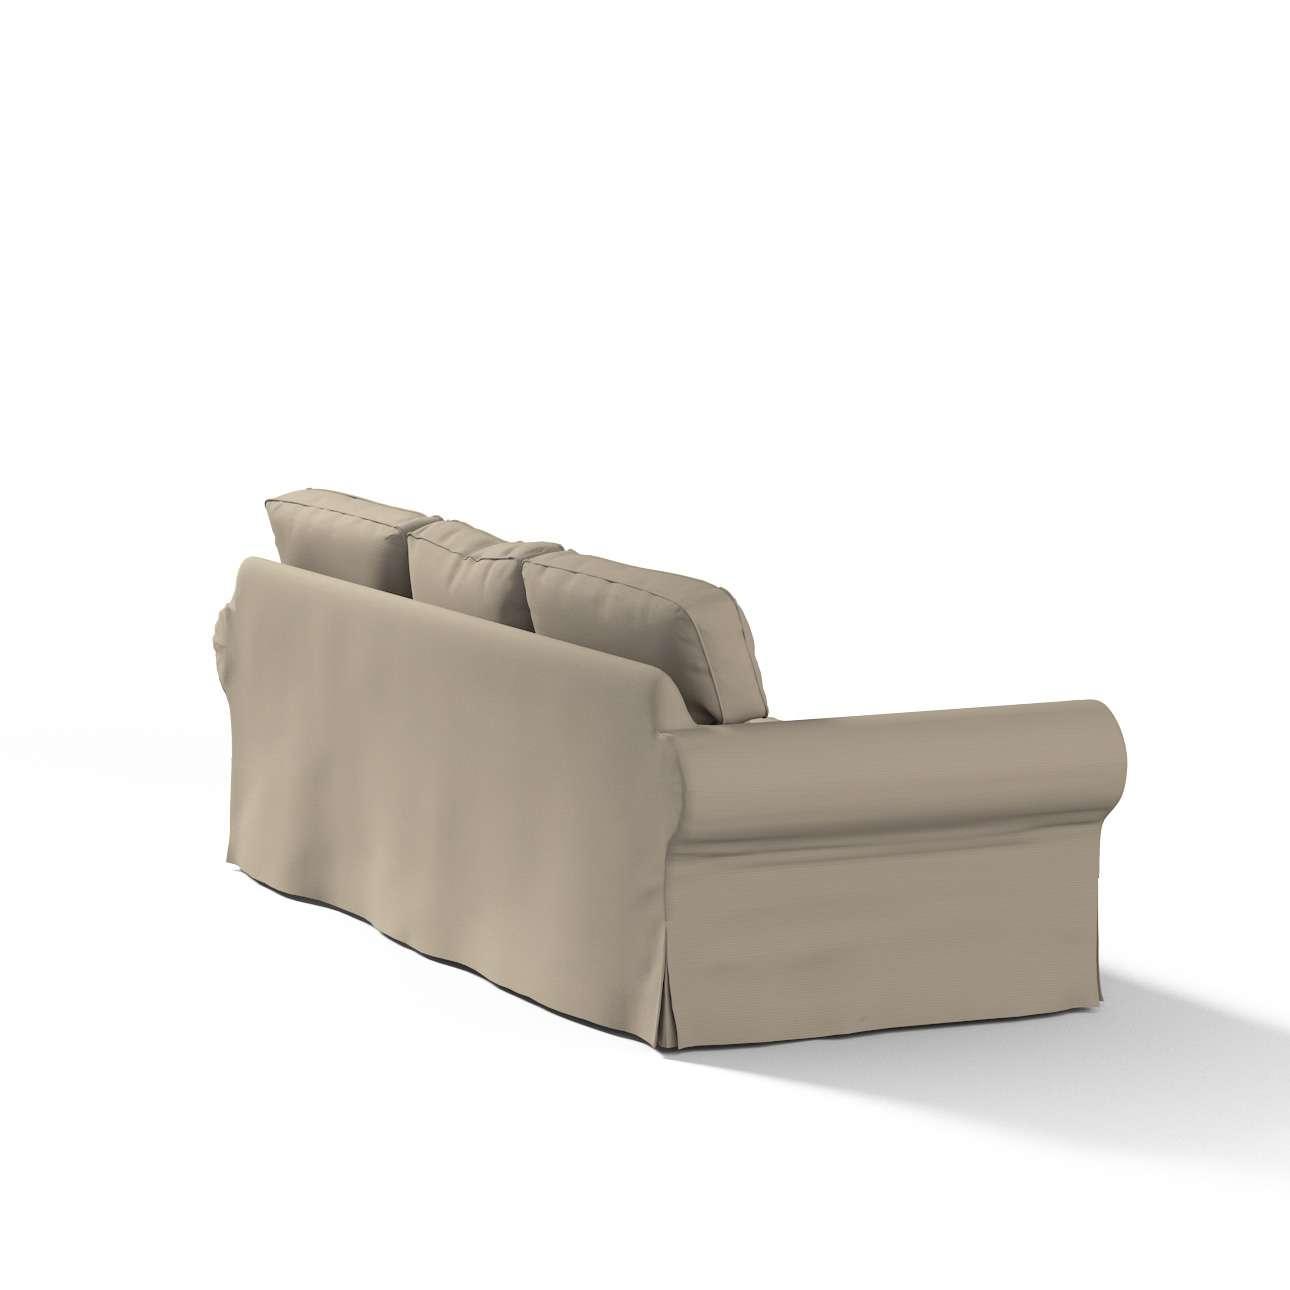 Poťah na sedačku Ektorp 3 osoby (rozkladací) NOVÝ MODEL 2013 V kolekcii Cotton Panama, tkanina: 702-28